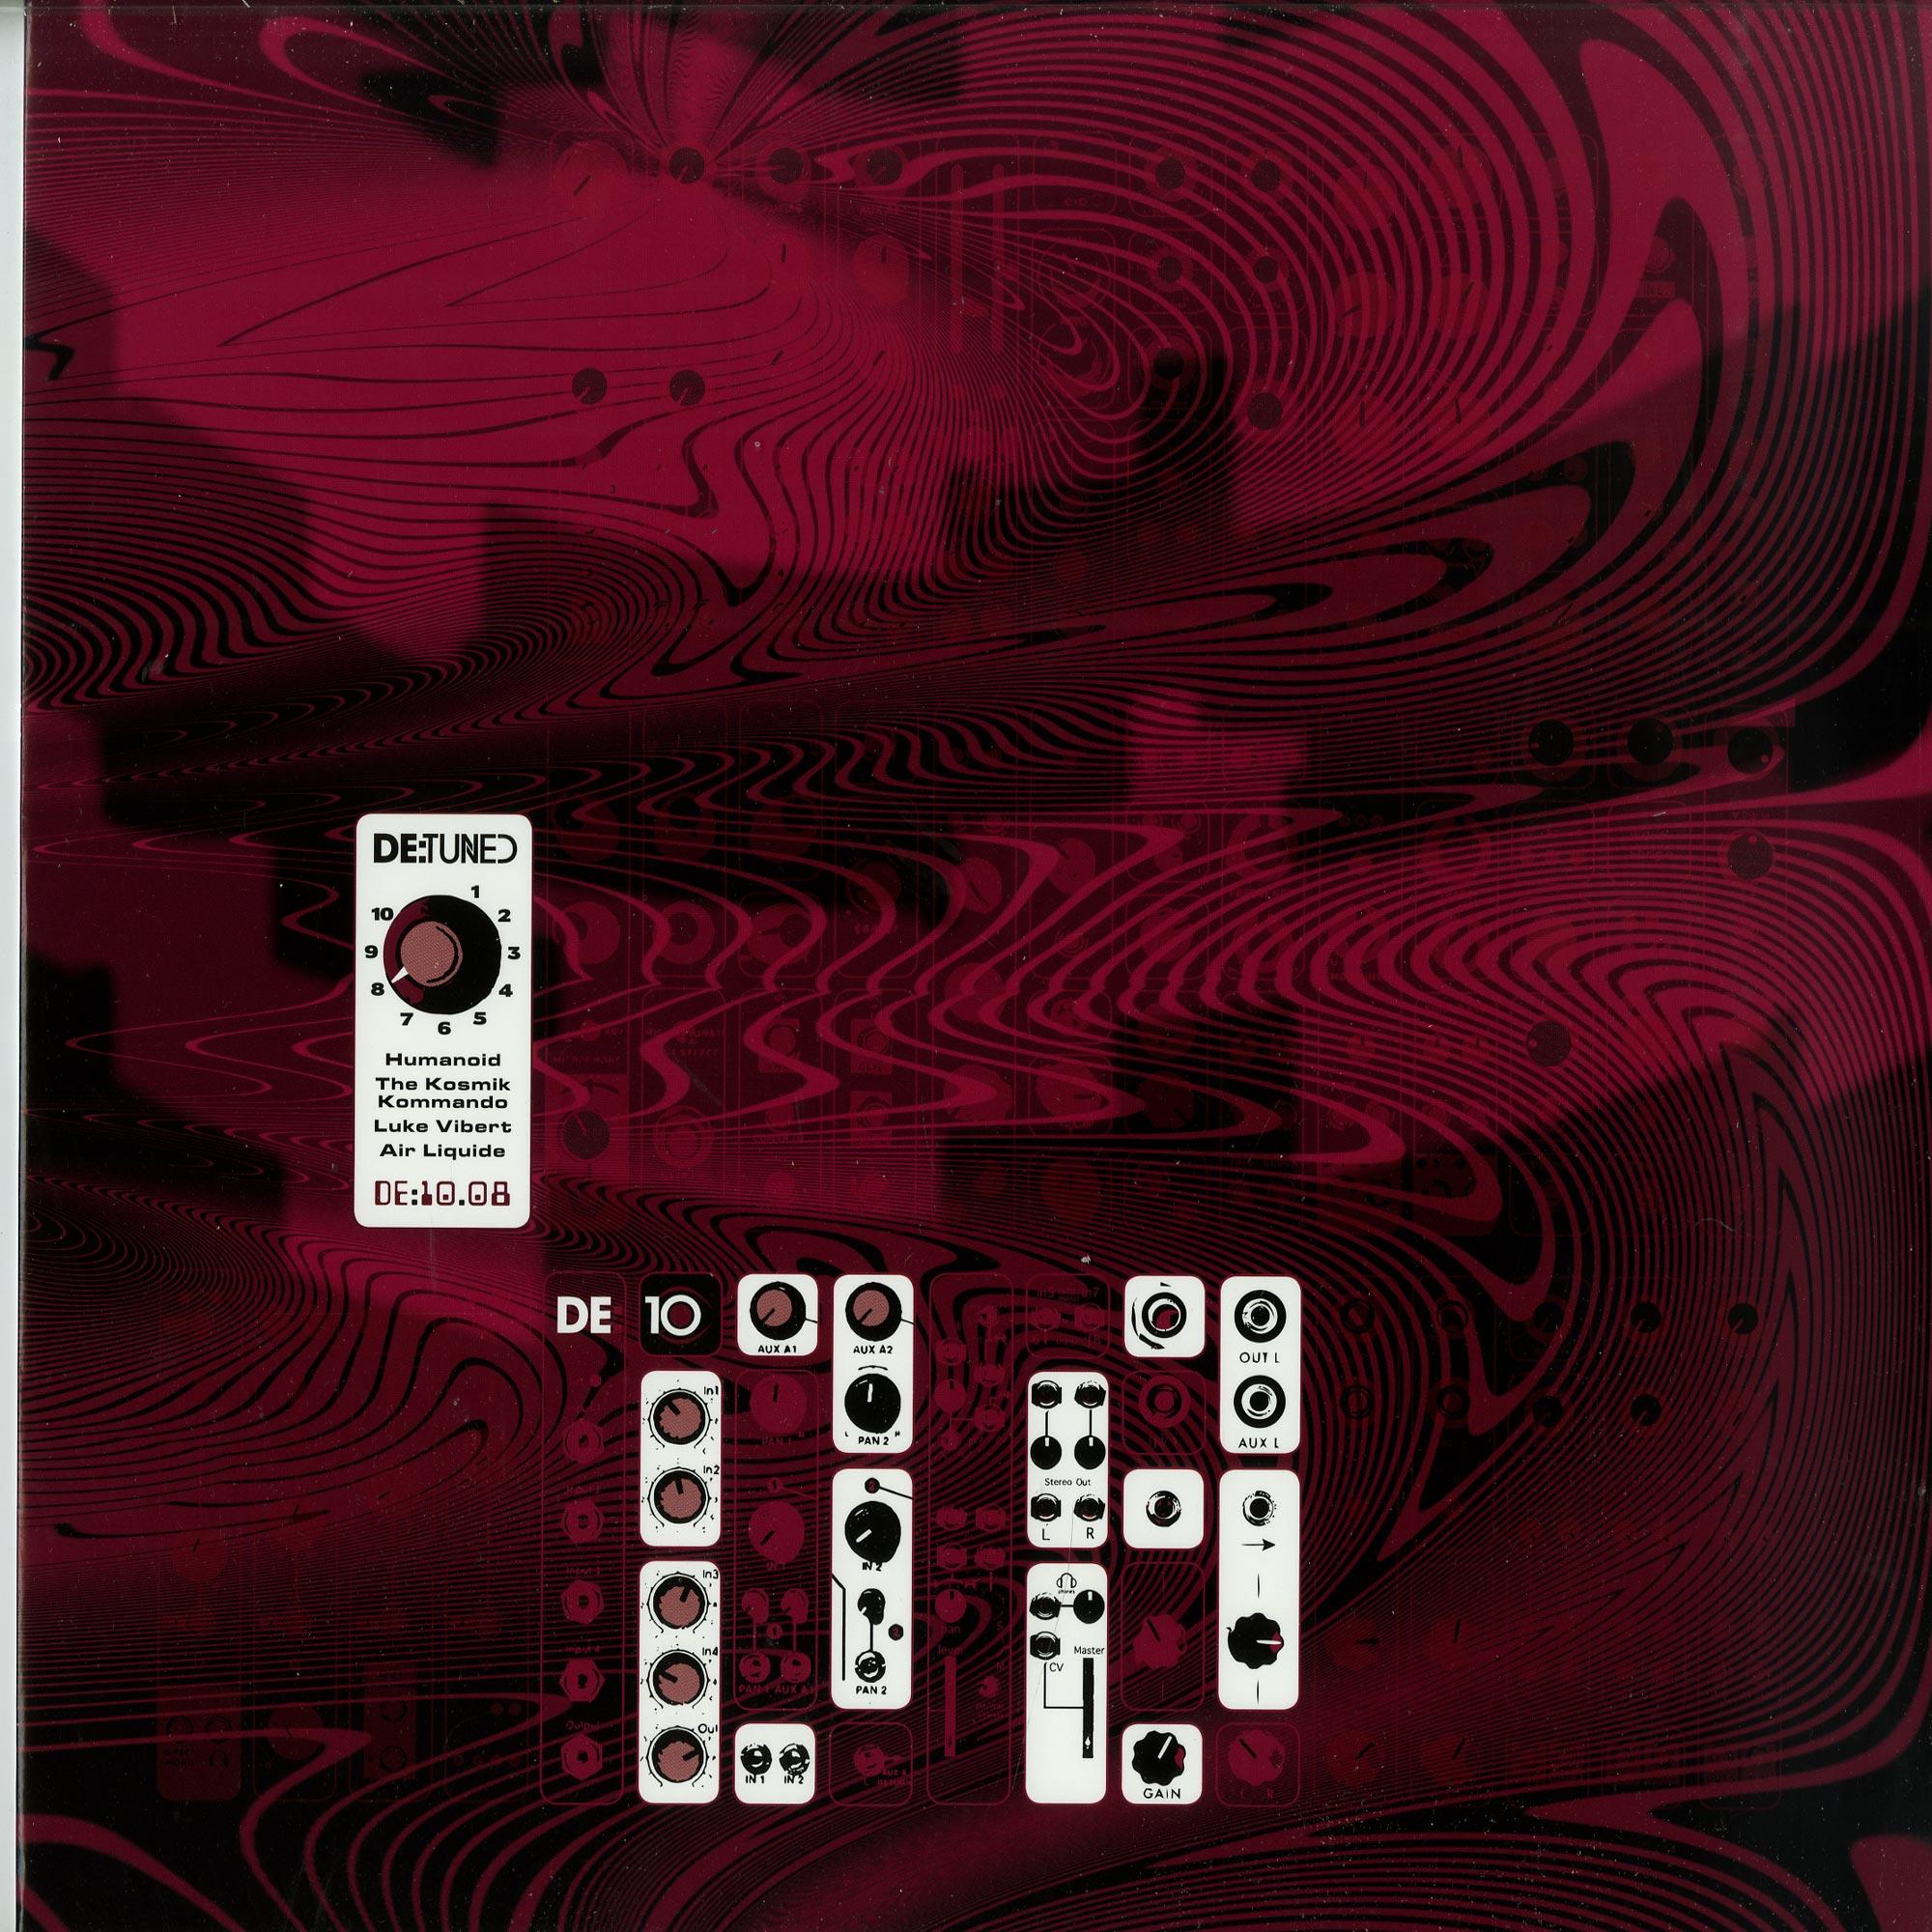 Humanoid / The Kosmik Kommando / Luke Vibert / Air Liquide - DE:10.08